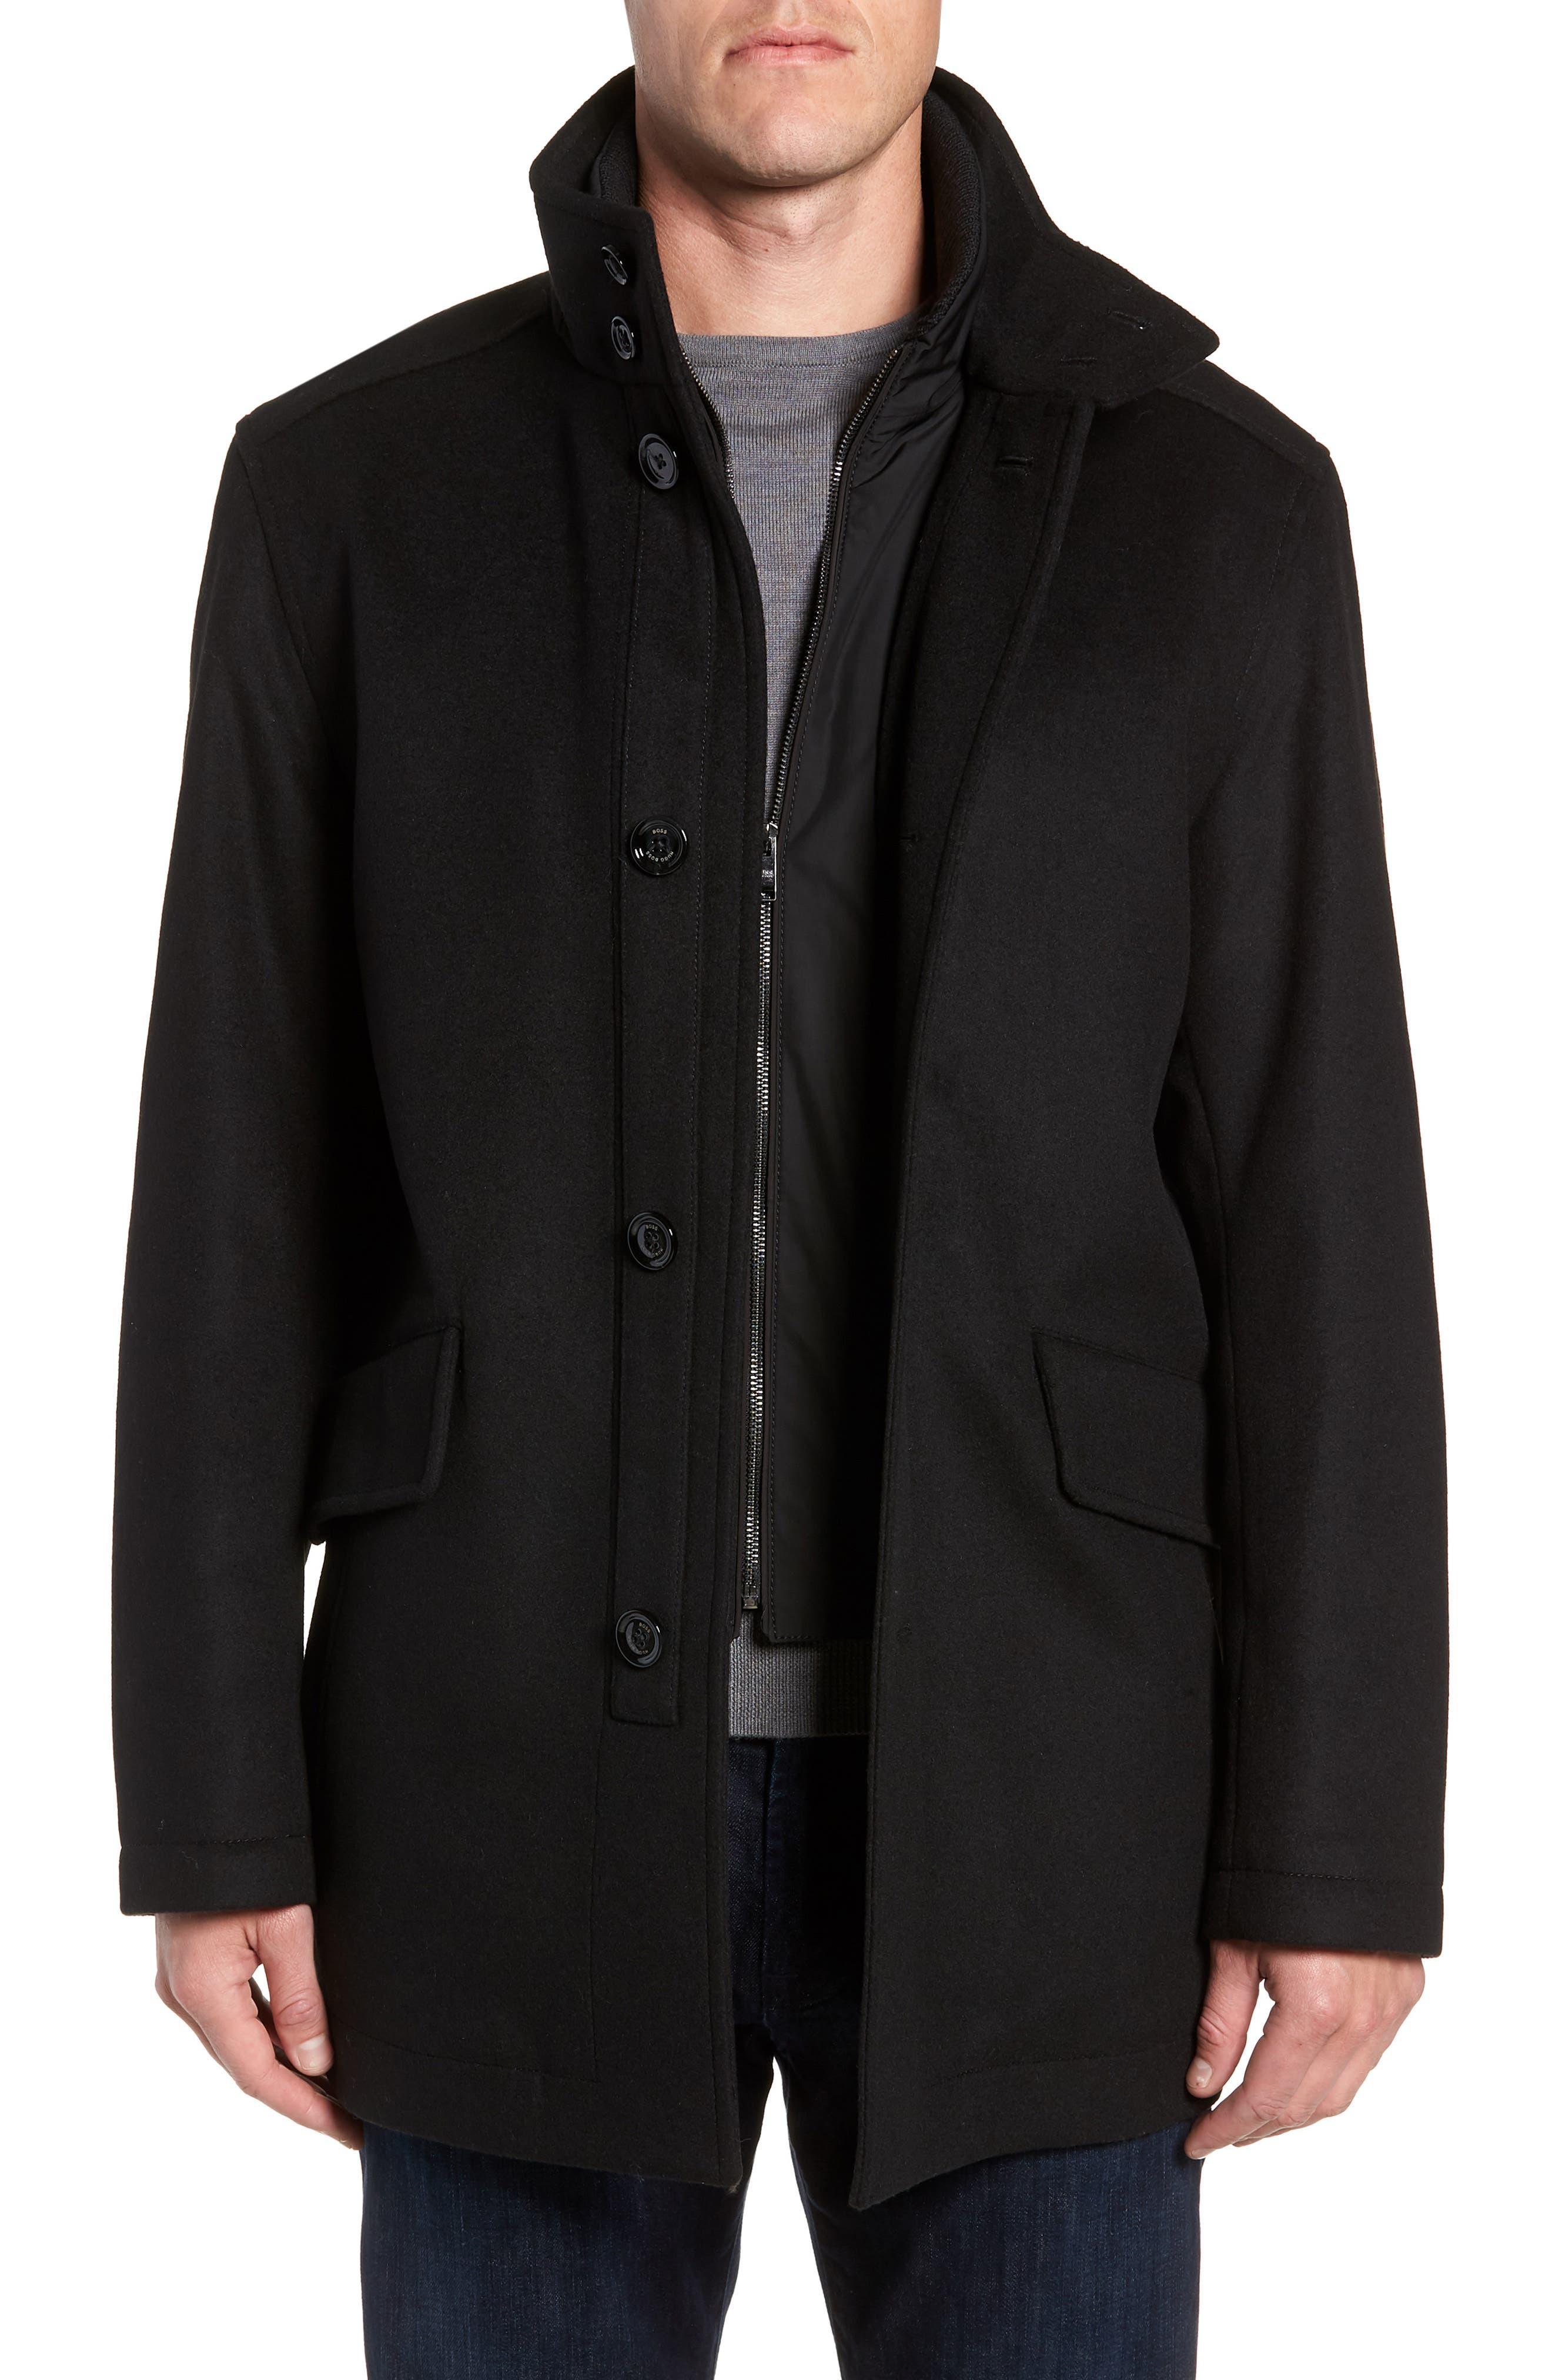 Coxtan Wool Regular Fit Car Coat,                             Main thumbnail 1, color,                             BLACK